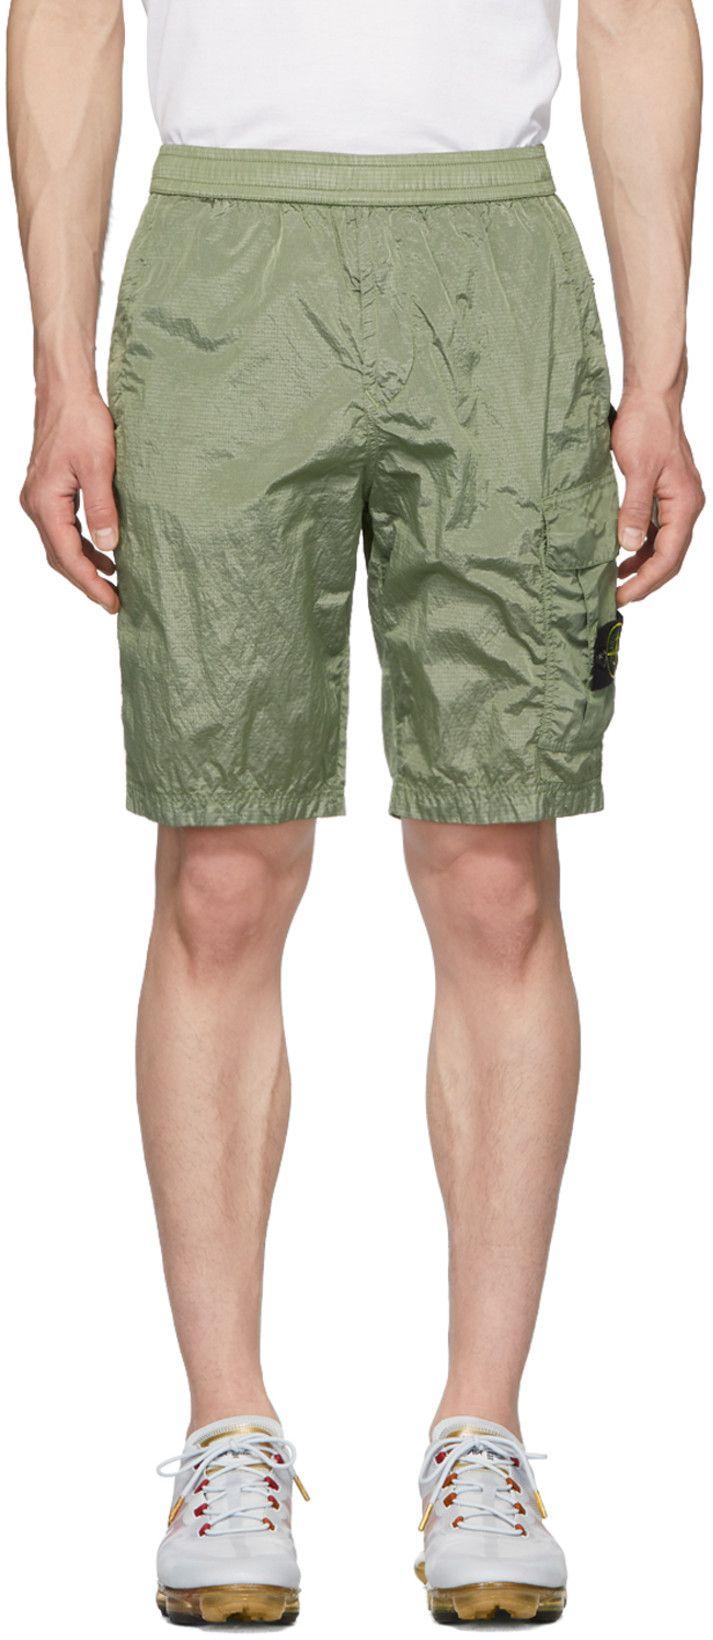 Stone Island Green Bermuda Shorts Ssense Stone Island Clothing Stone Island Bermuda Shorts